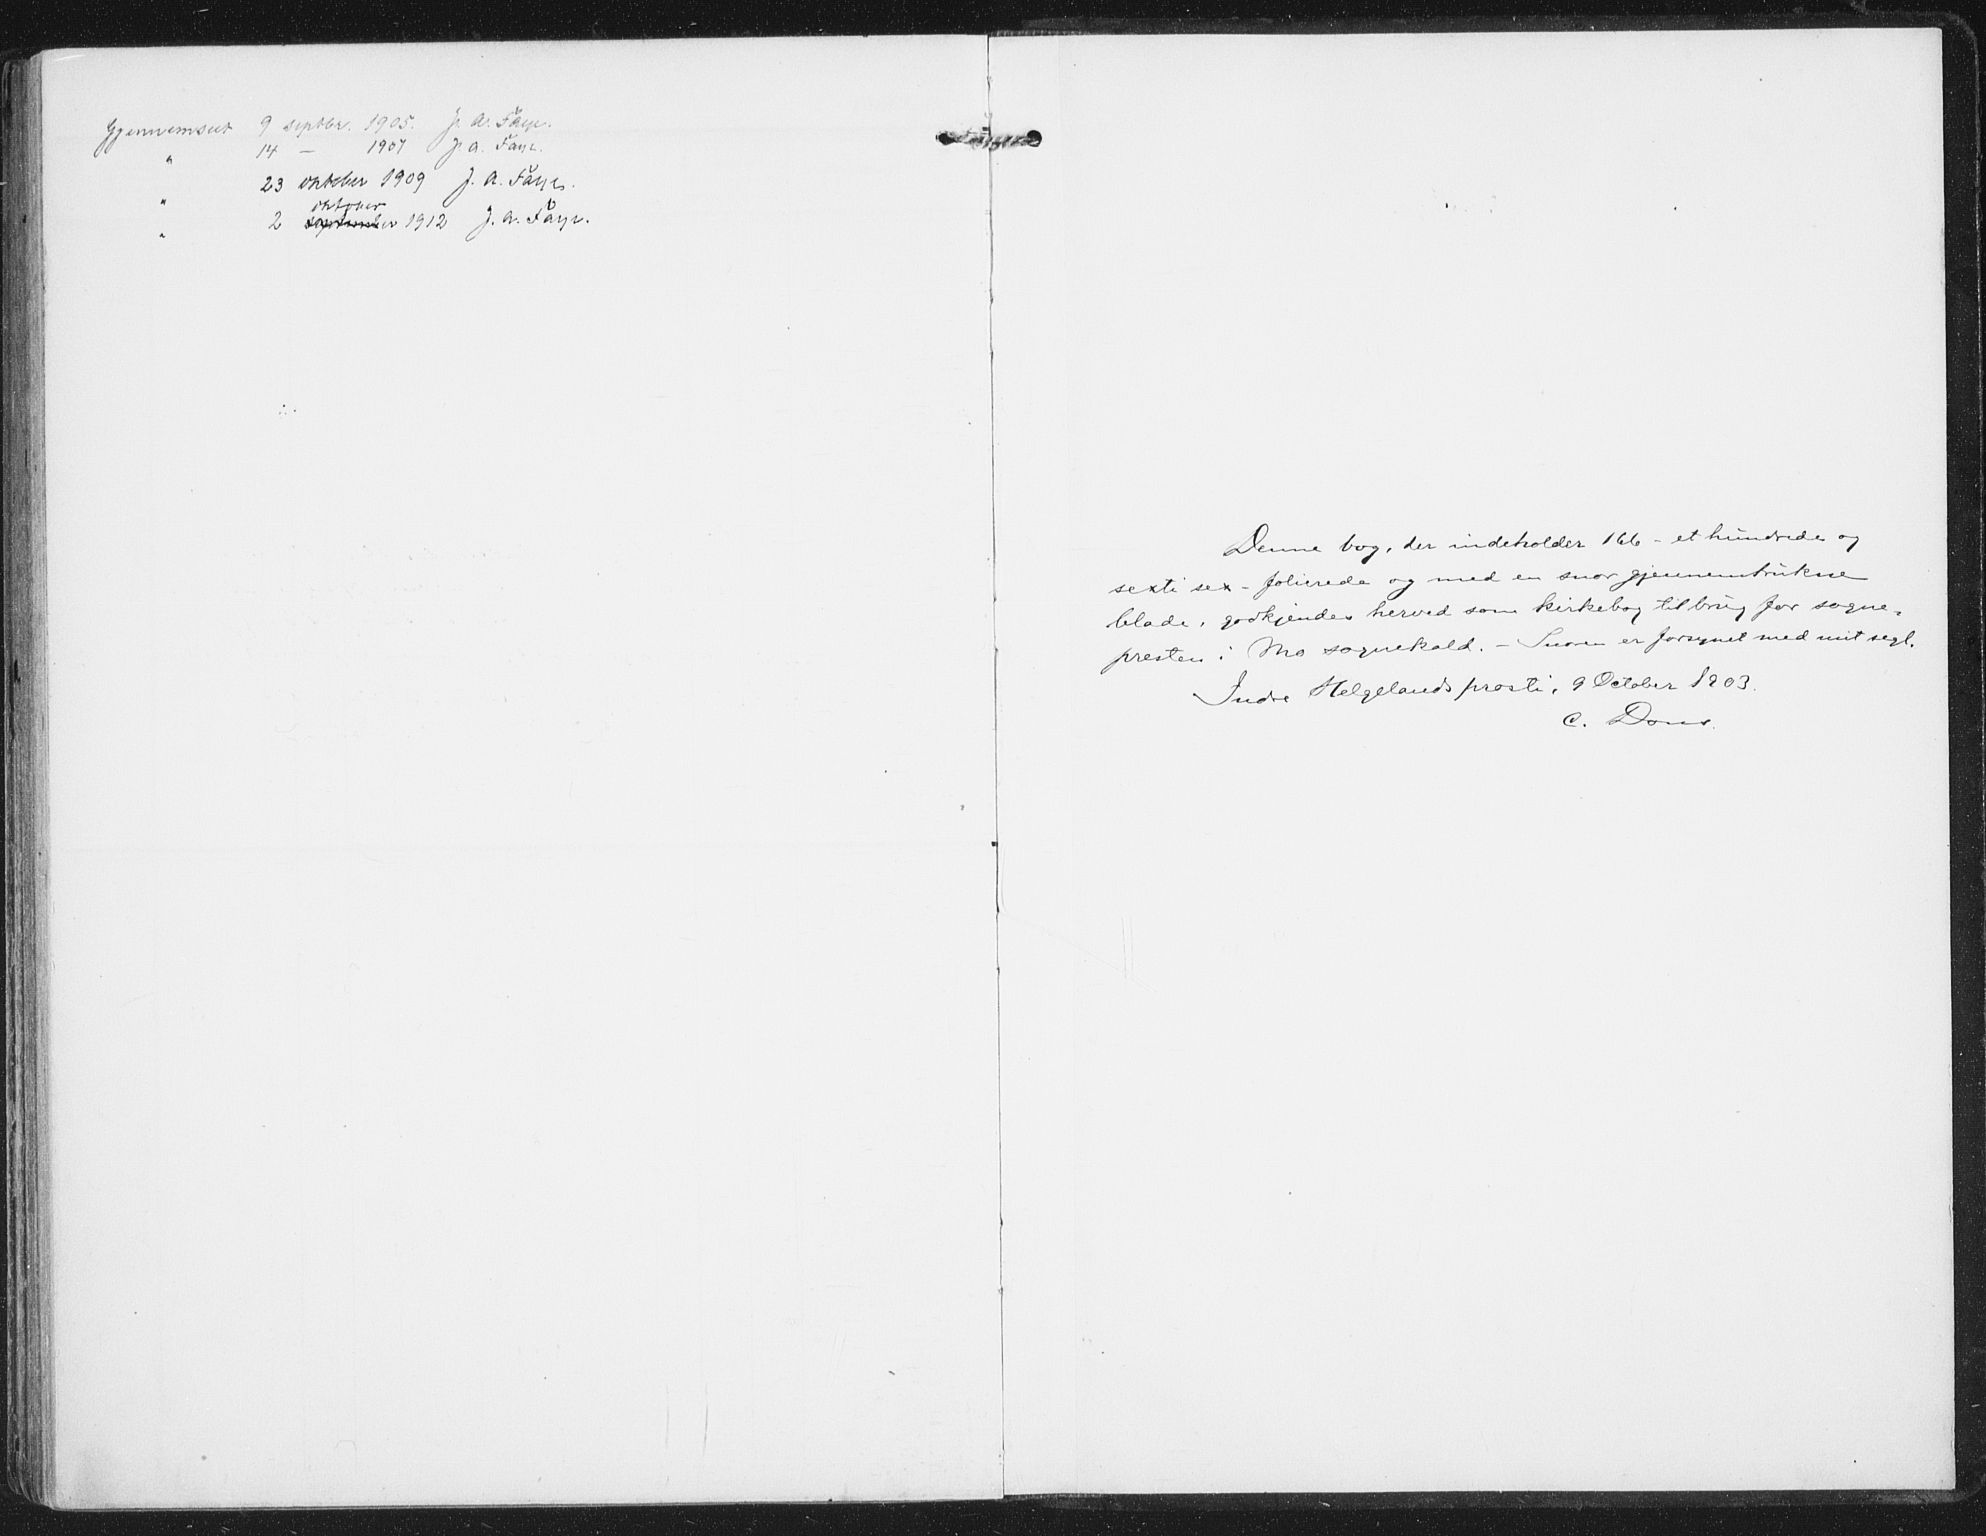 SAT, Ministerialprotokoller, klokkerbøker og fødselsregistre - Nordland, 827/L0402: Ministerialbok nr. 827A14, 1903-1912